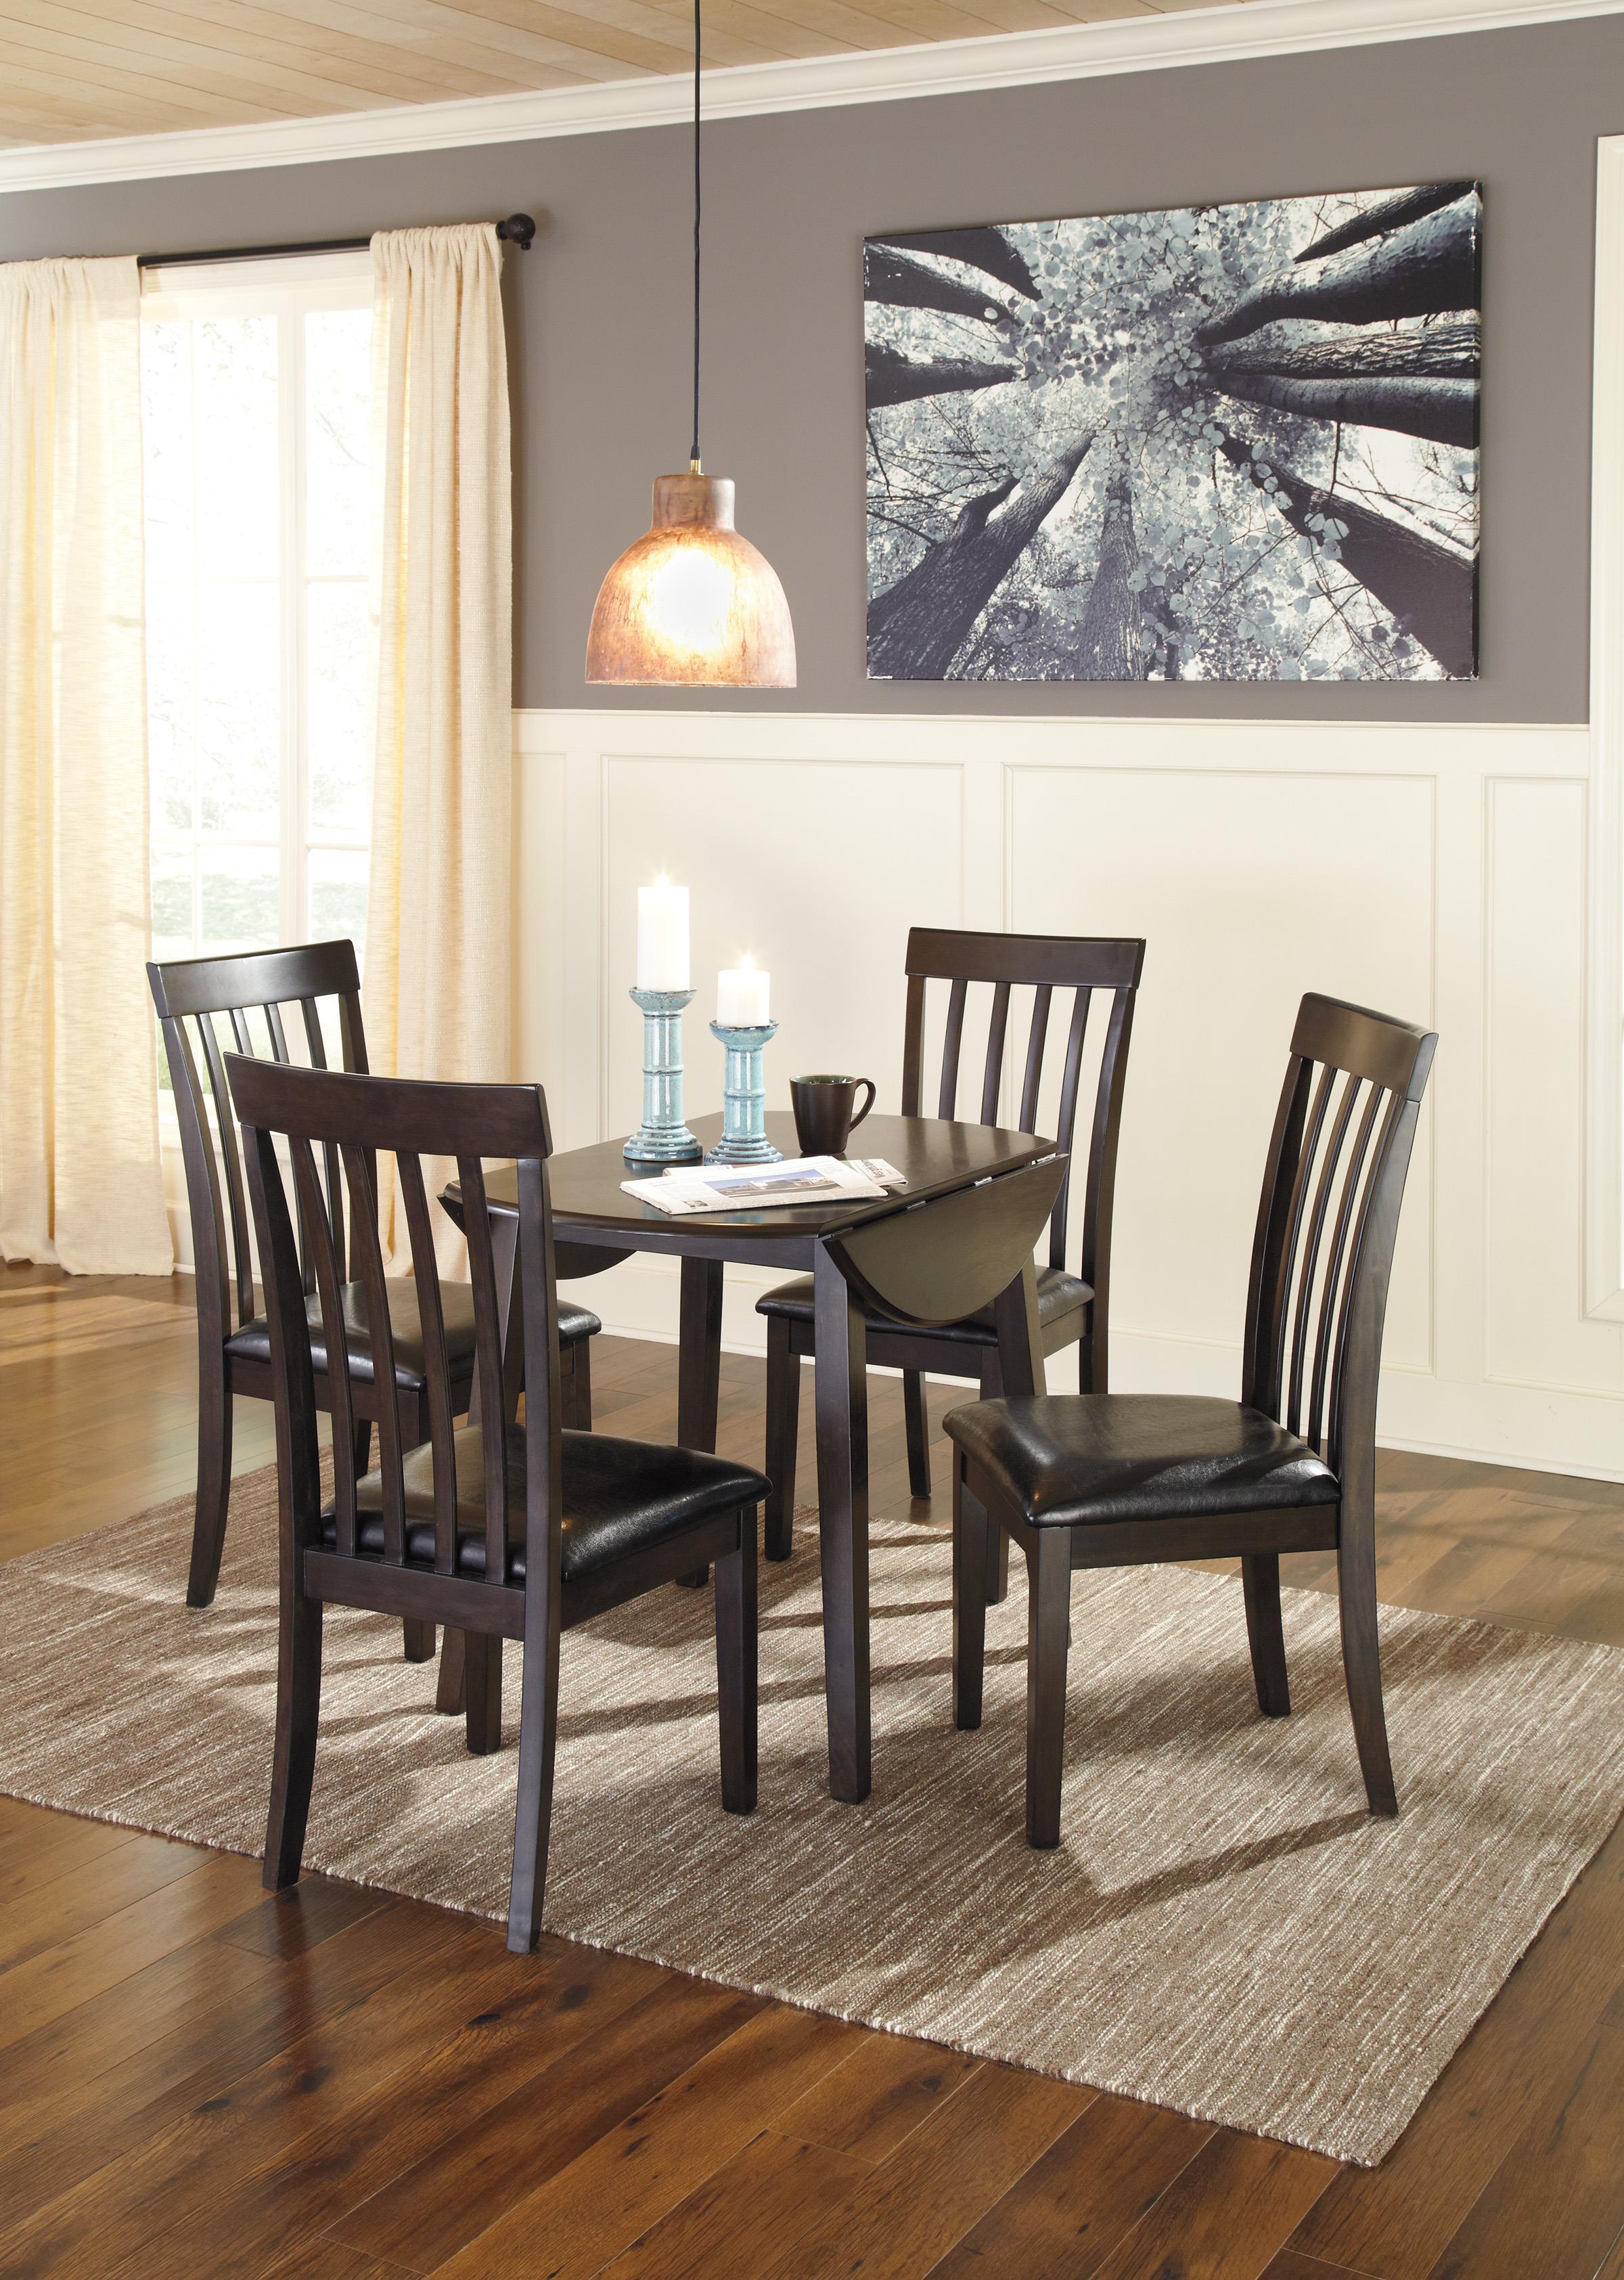 Ashley S Nest Decorating A Dining Room: Ashley Signature Design Hammis Round Dining Room Drop Leaf